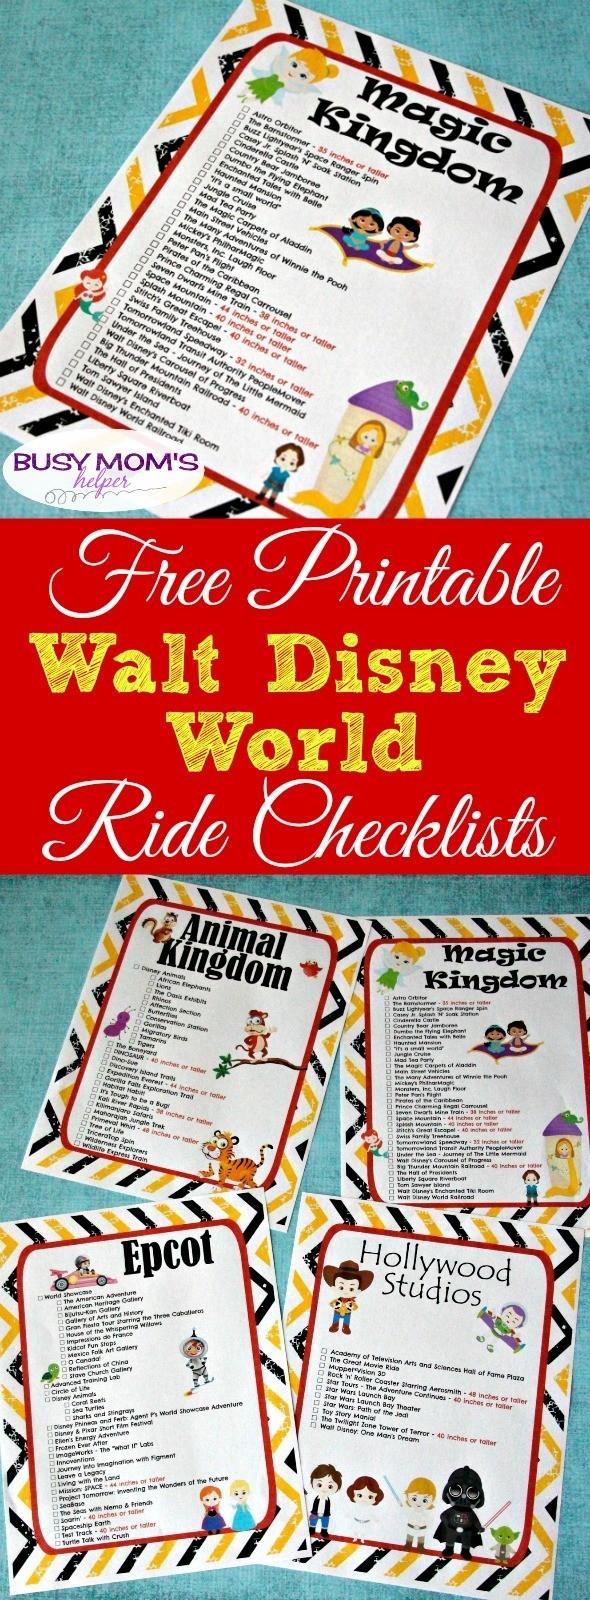 Free Printable Walt Disney World Ride Checklists  Printable Disney World Attractions List